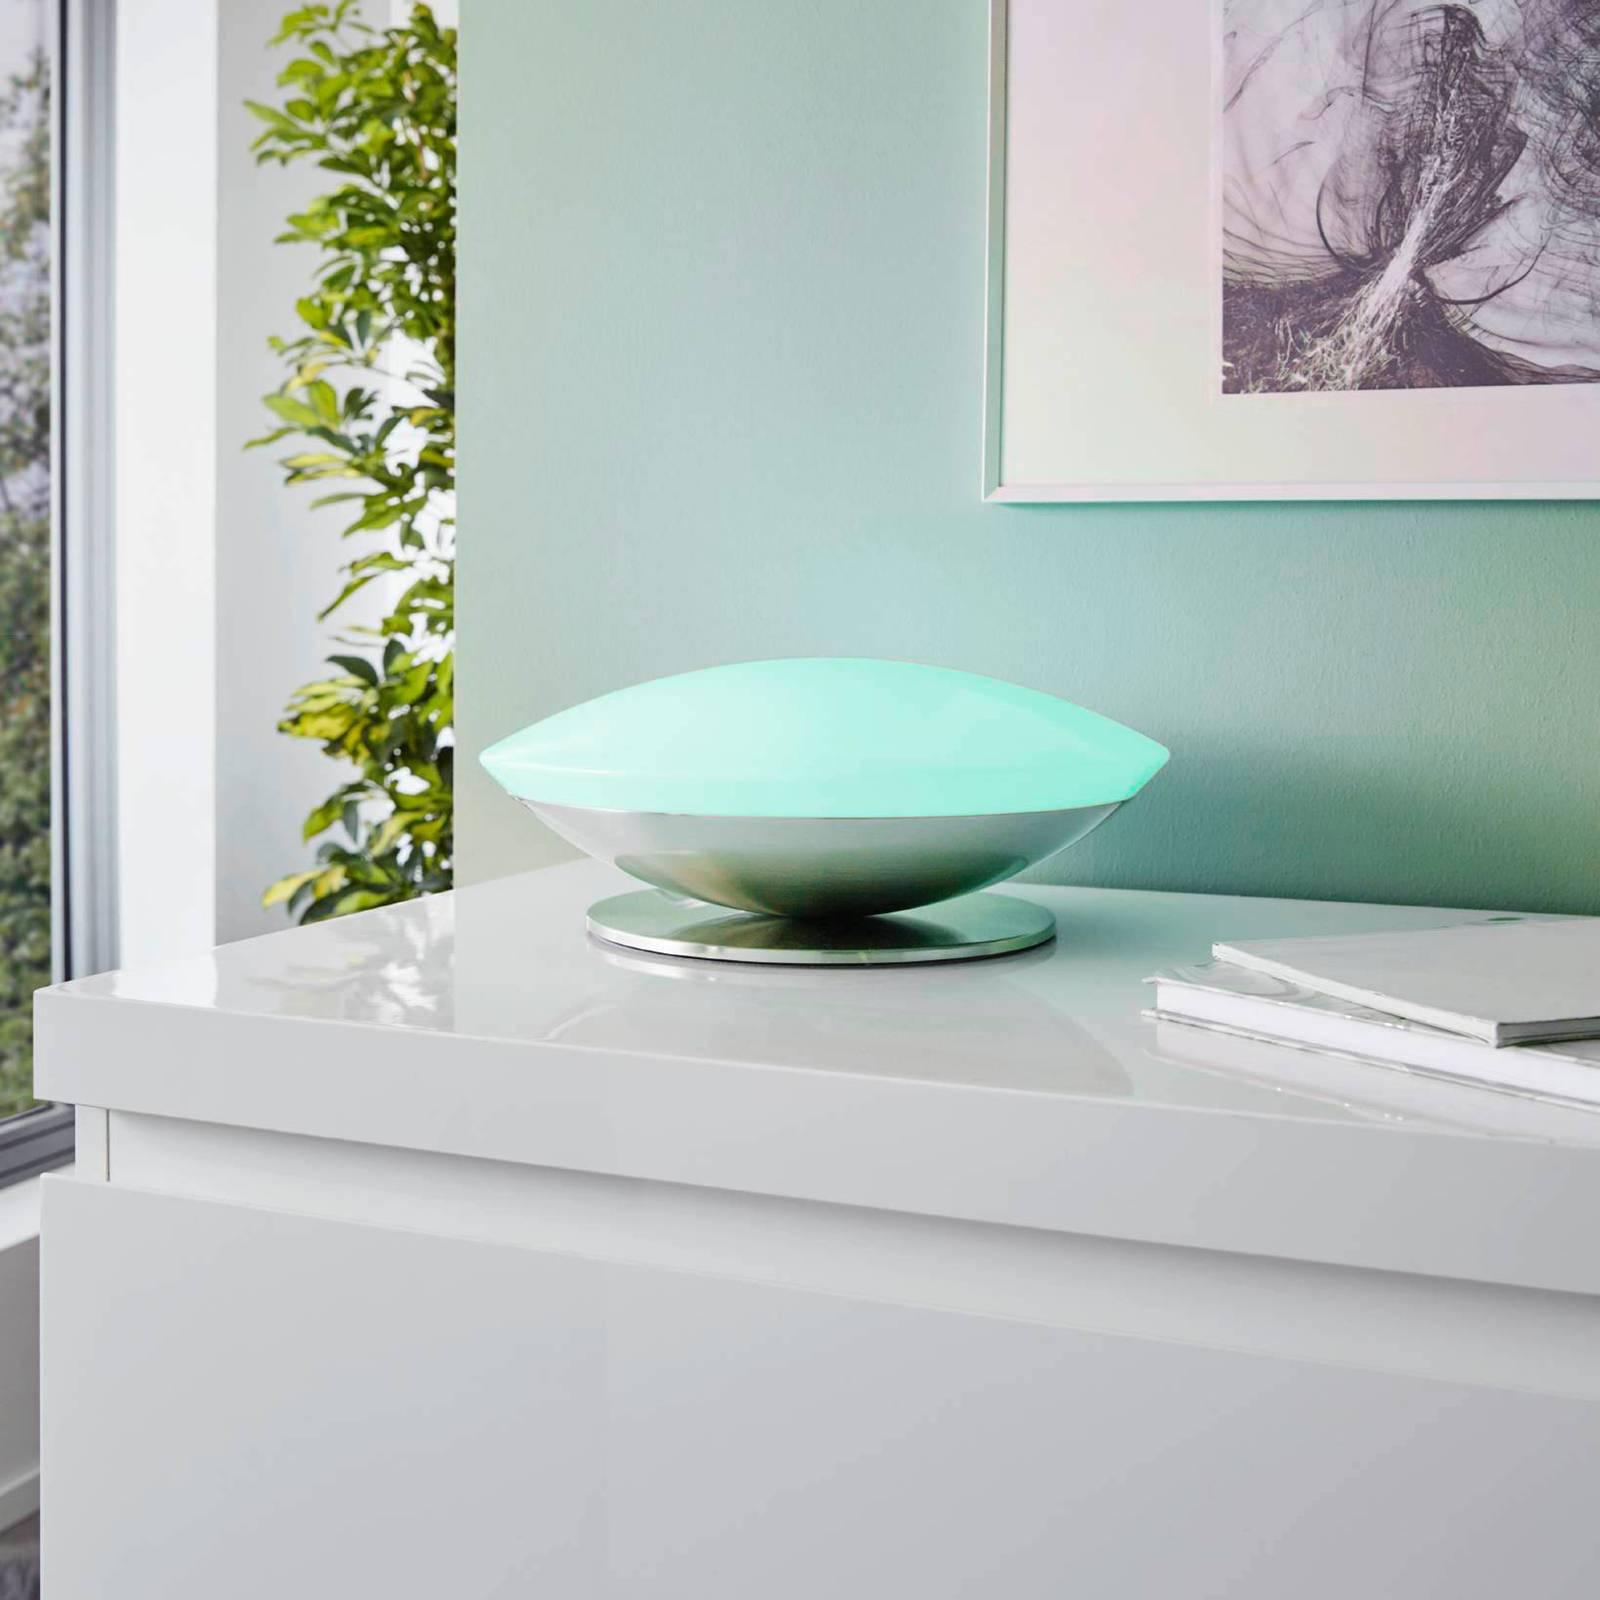 EGLO connect Frattina-C -LED-pöytävalaisin